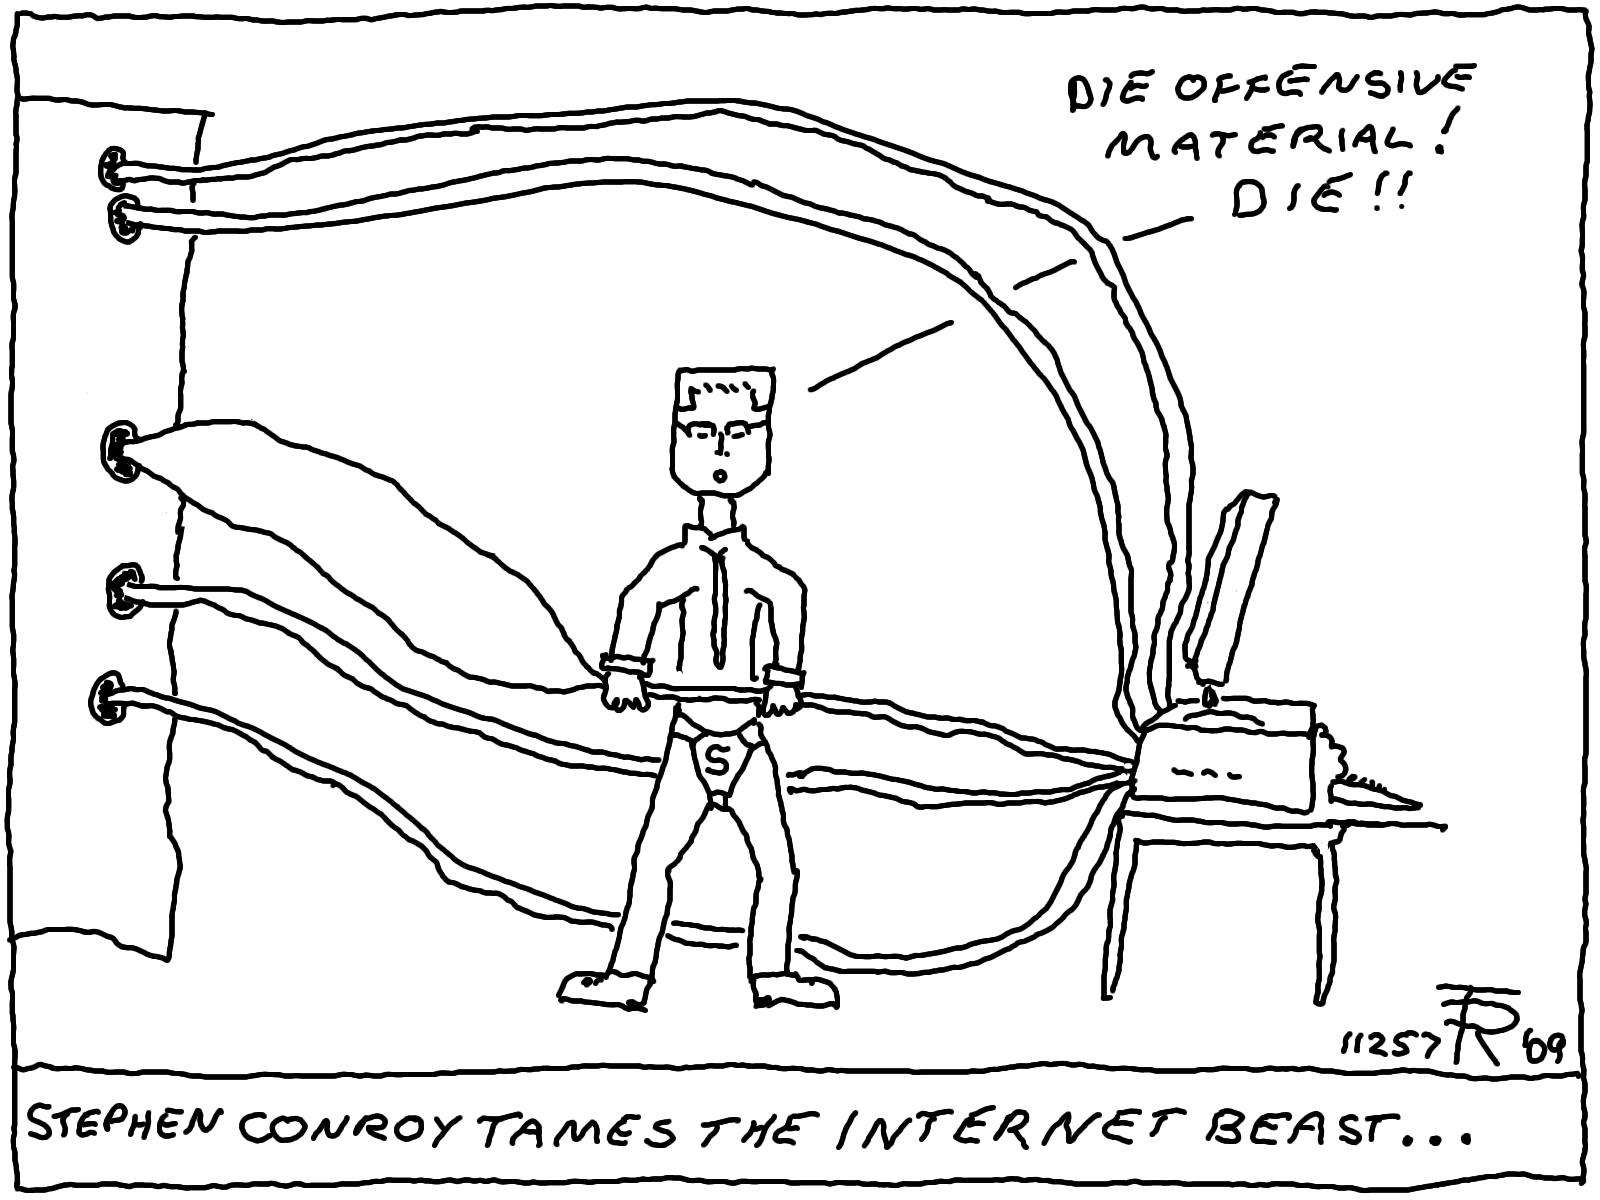 [Conroy+tames+the+internet+beast.jpg]